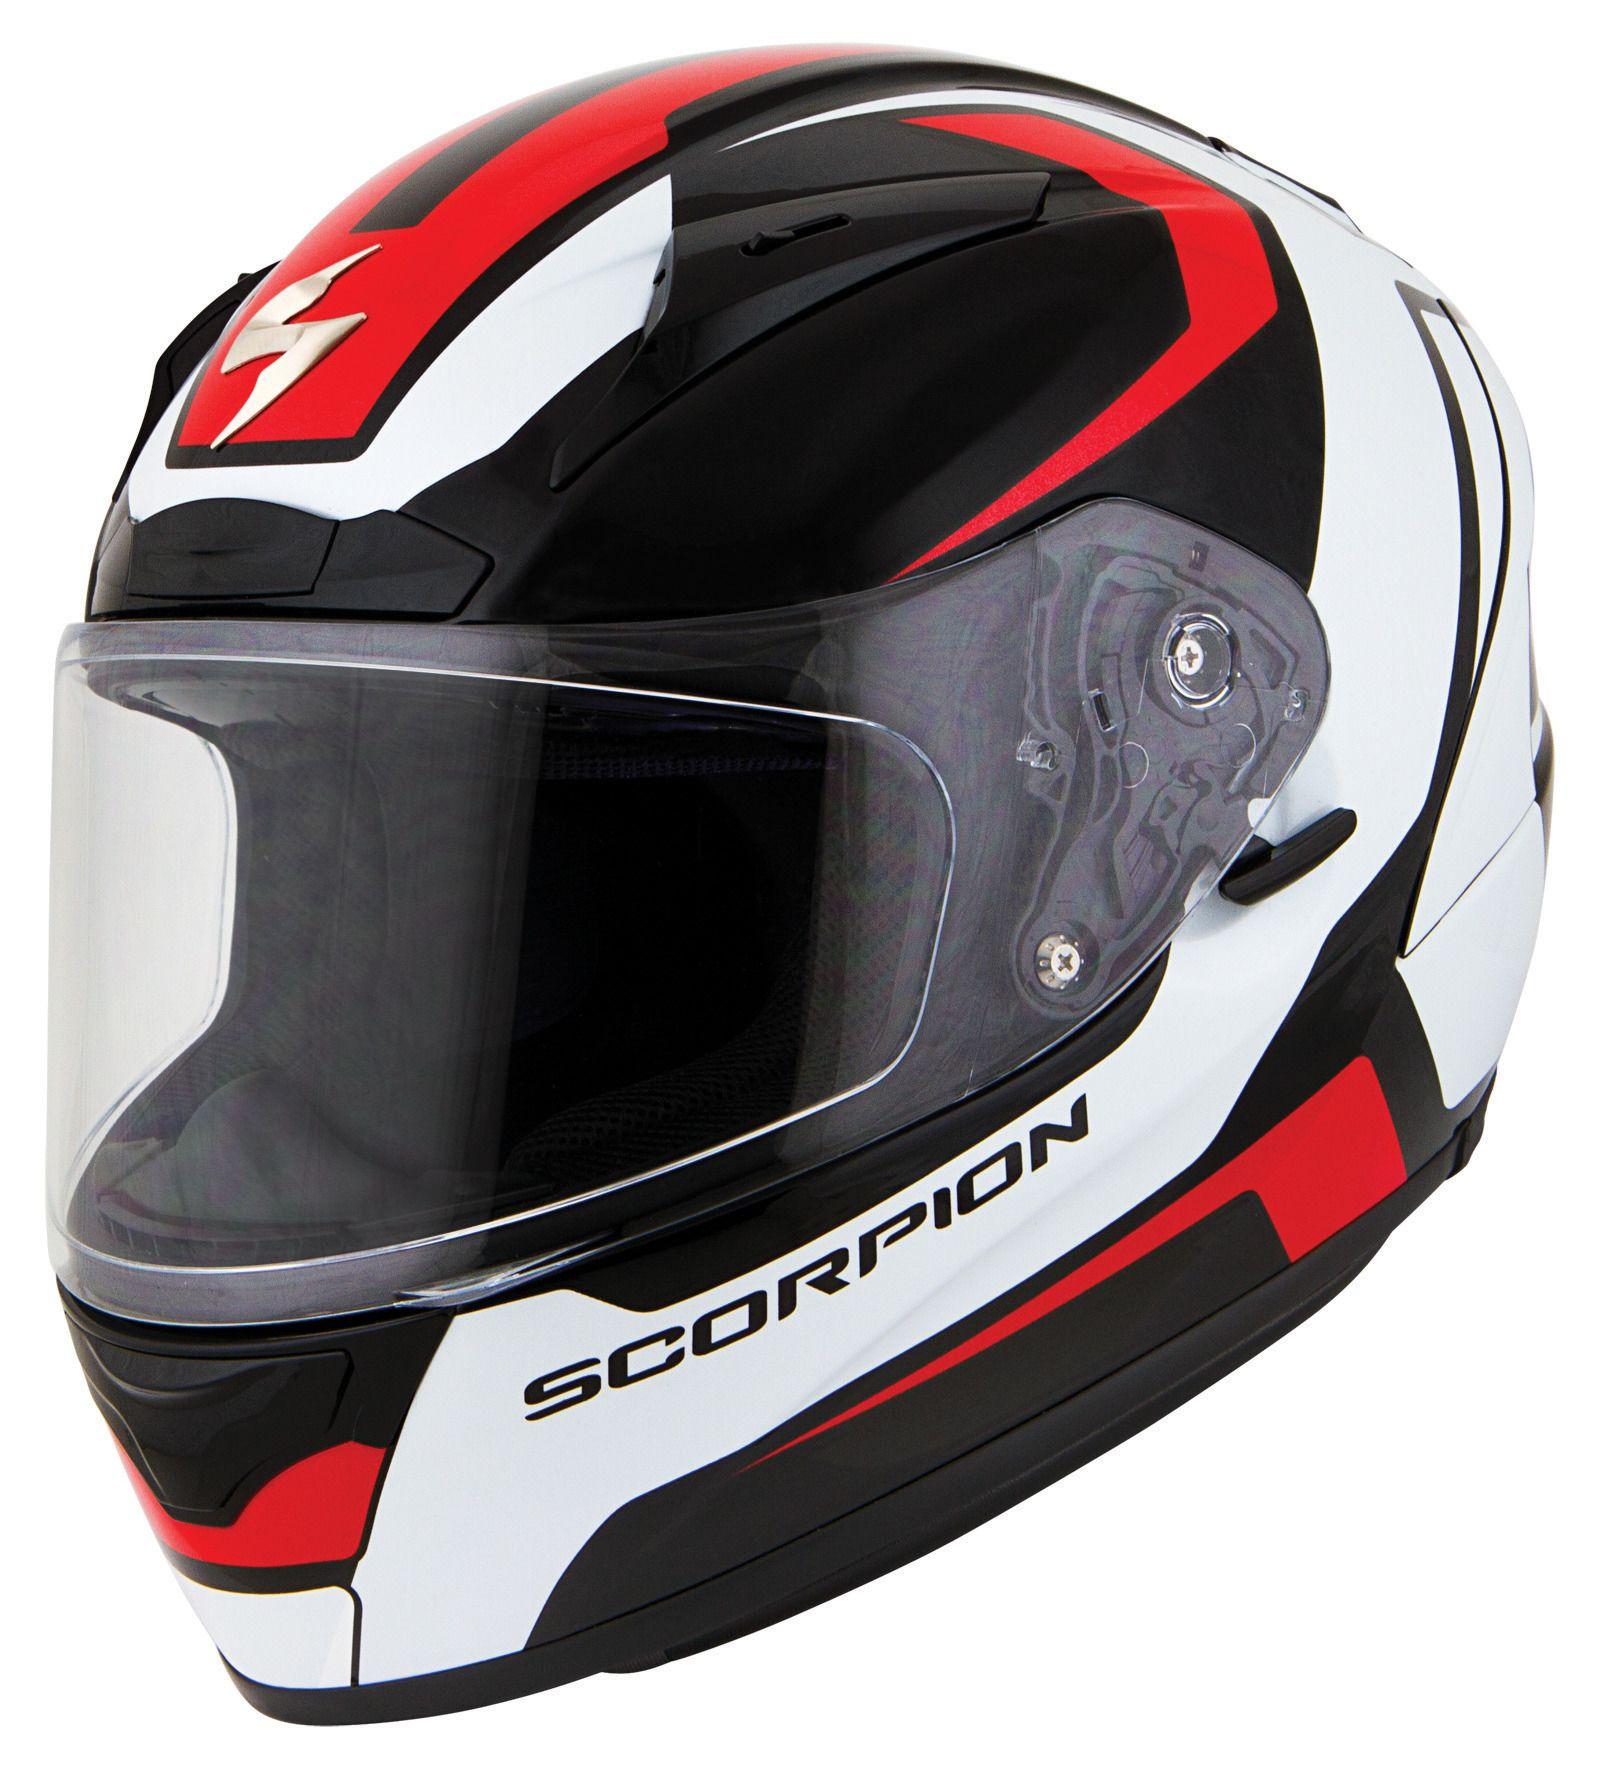 scorpion exo r2000 dispatch helmet size xl only revzilla. Black Bedroom Furniture Sets. Home Design Ideas